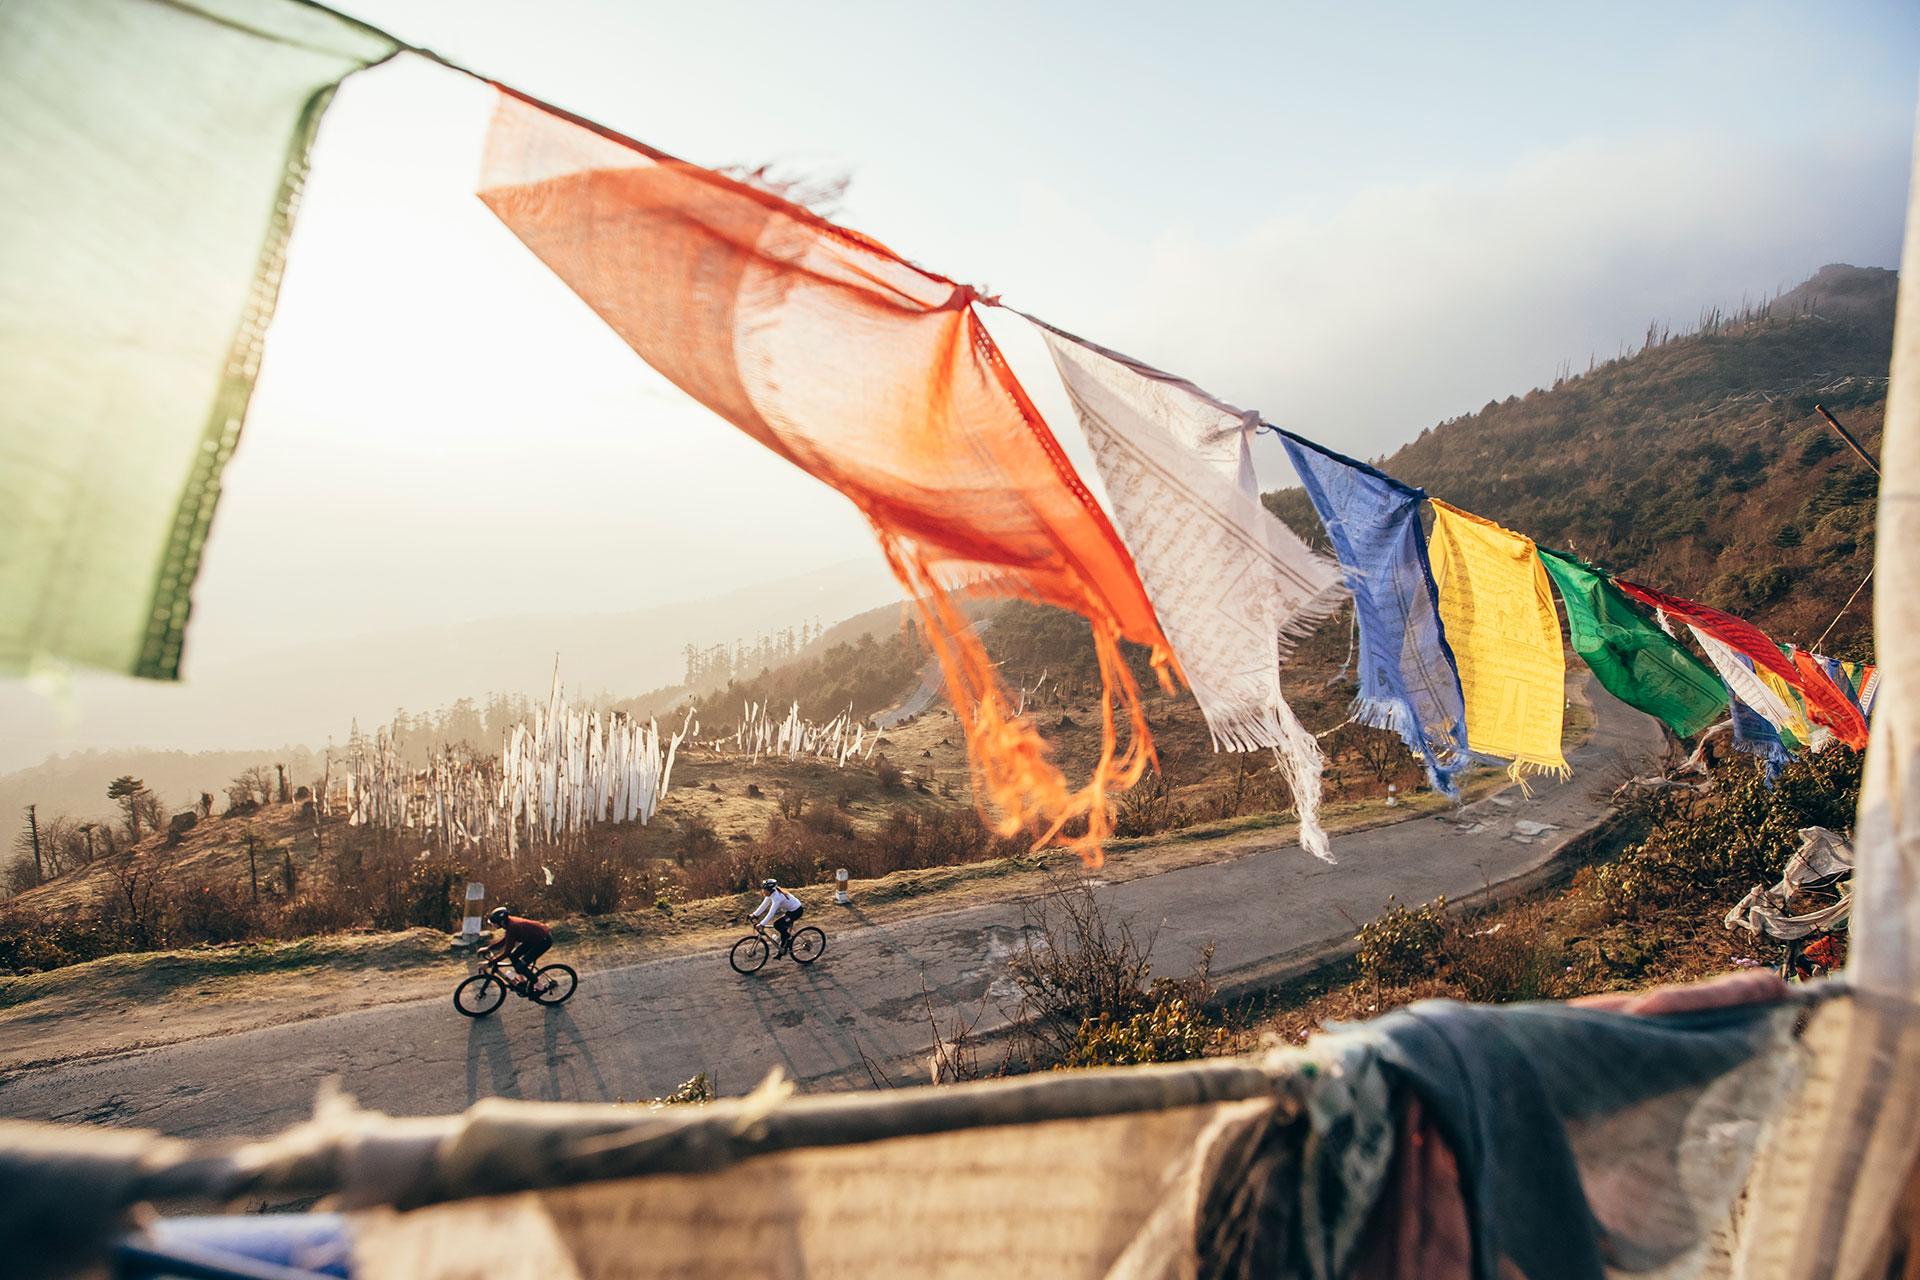 Fotograf Rennrad Reise Landschaft Chelata Bhutan Himalaya Asien